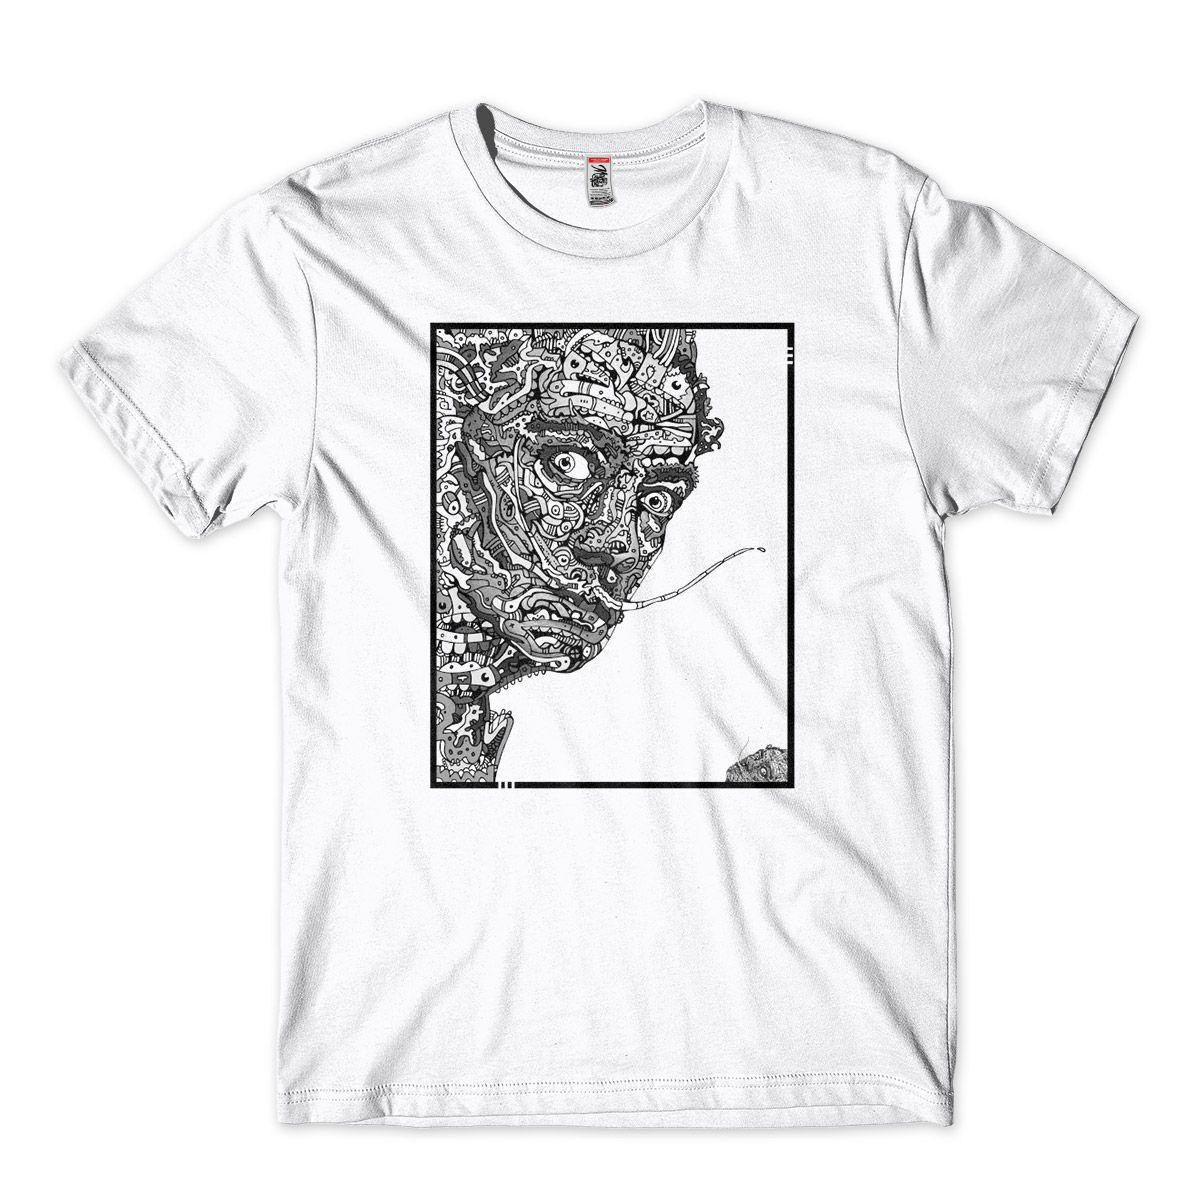 Camiseta salvador dali surrealismo Retrato Geometrico